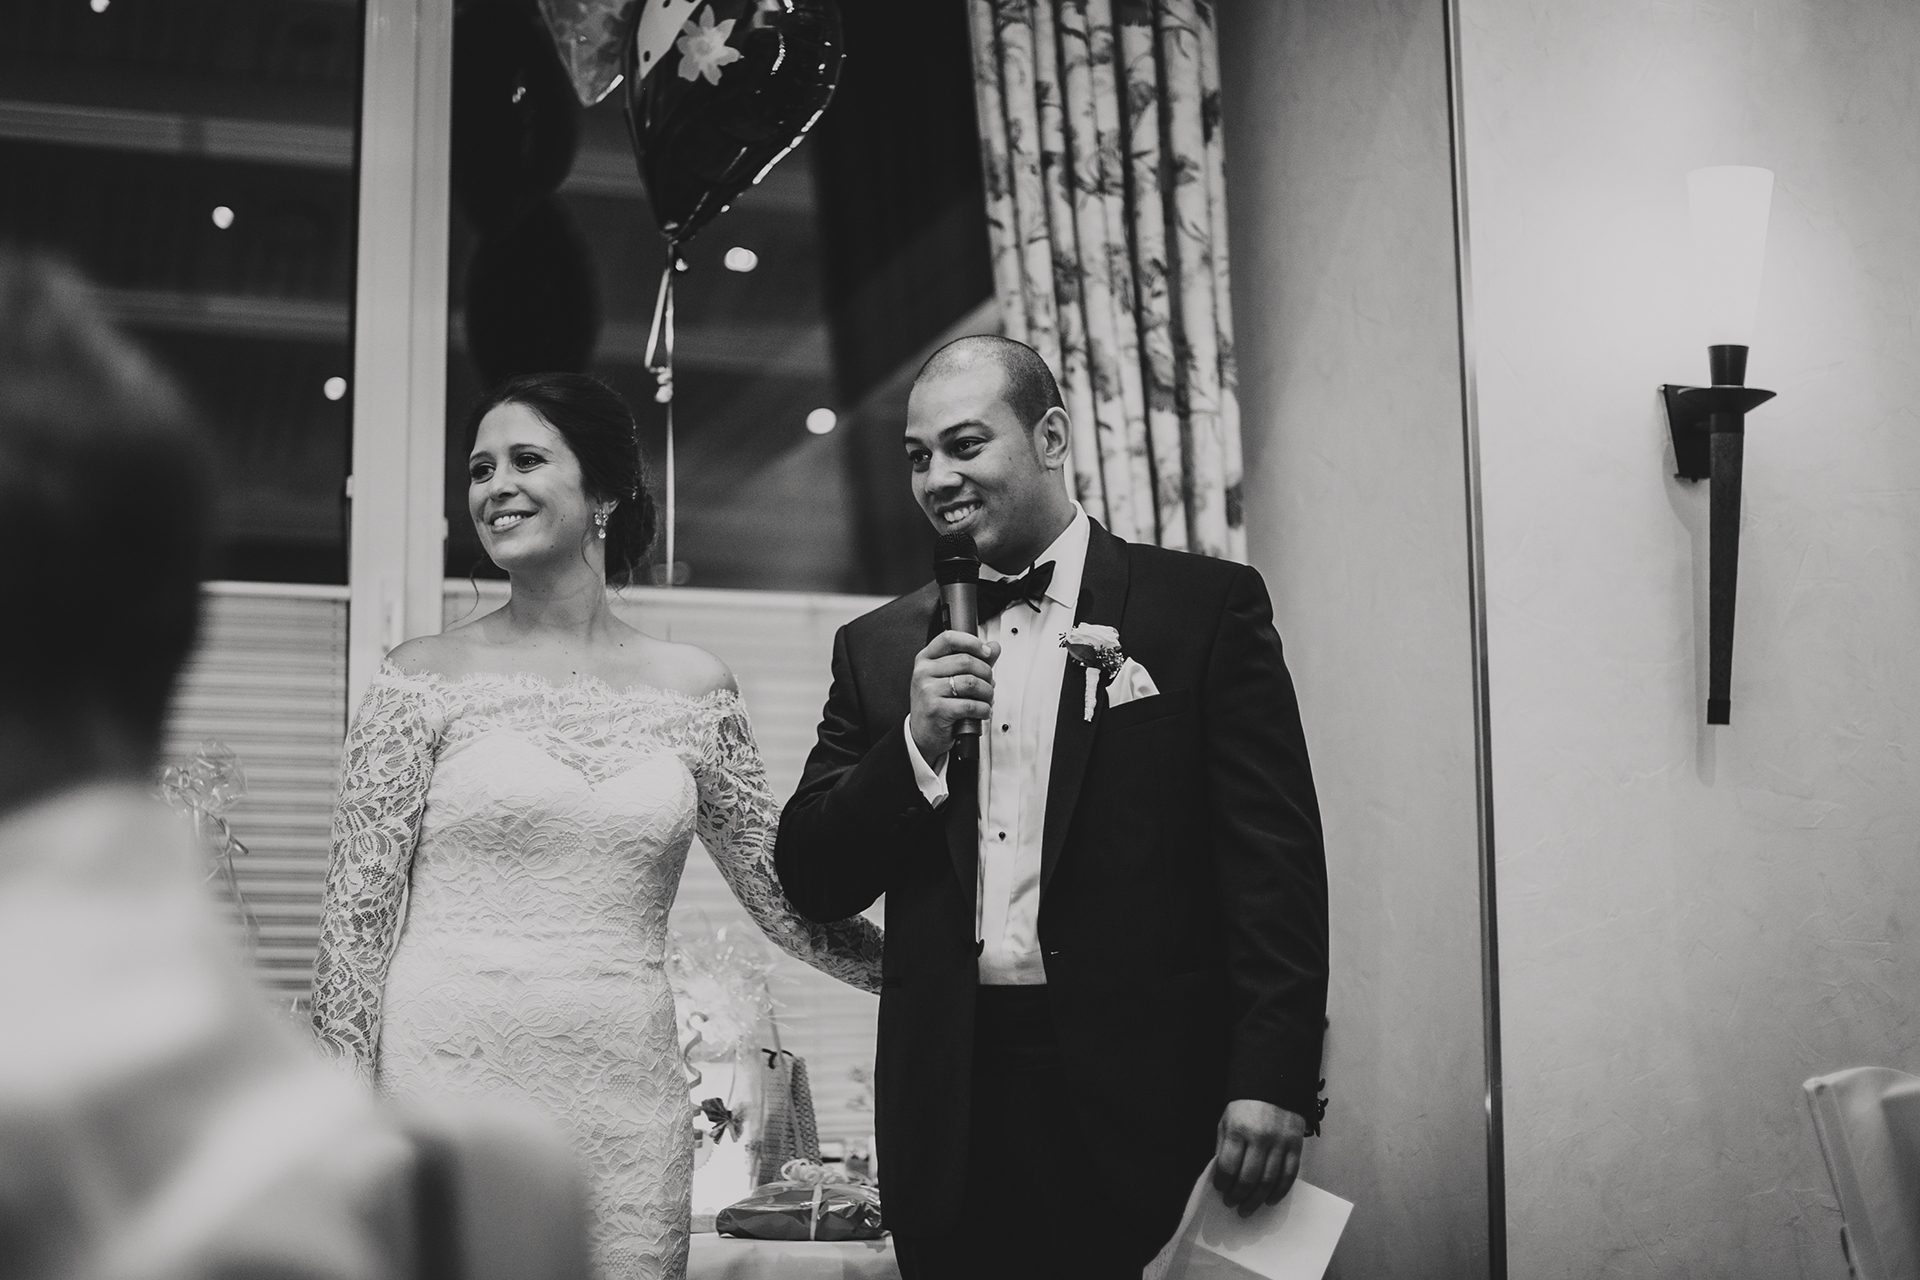 Hochzeitsreportage_J&D_098_Caroline Queda Fotografie